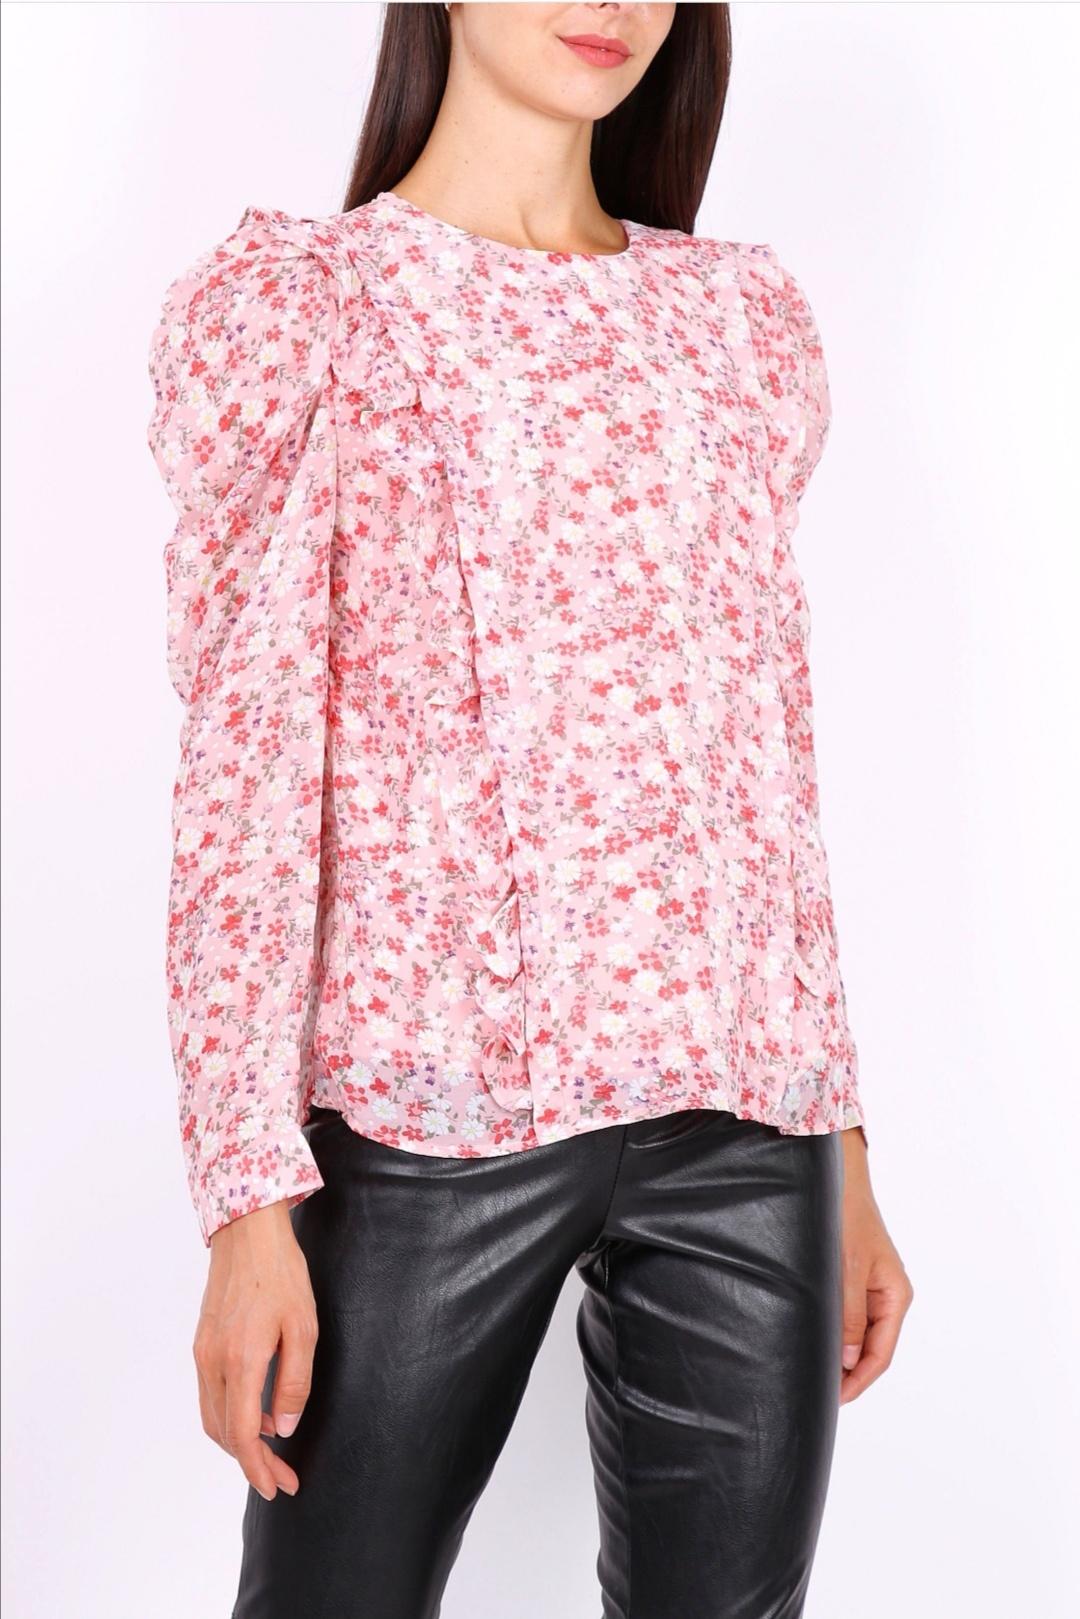 PEPITES blouse charline-1